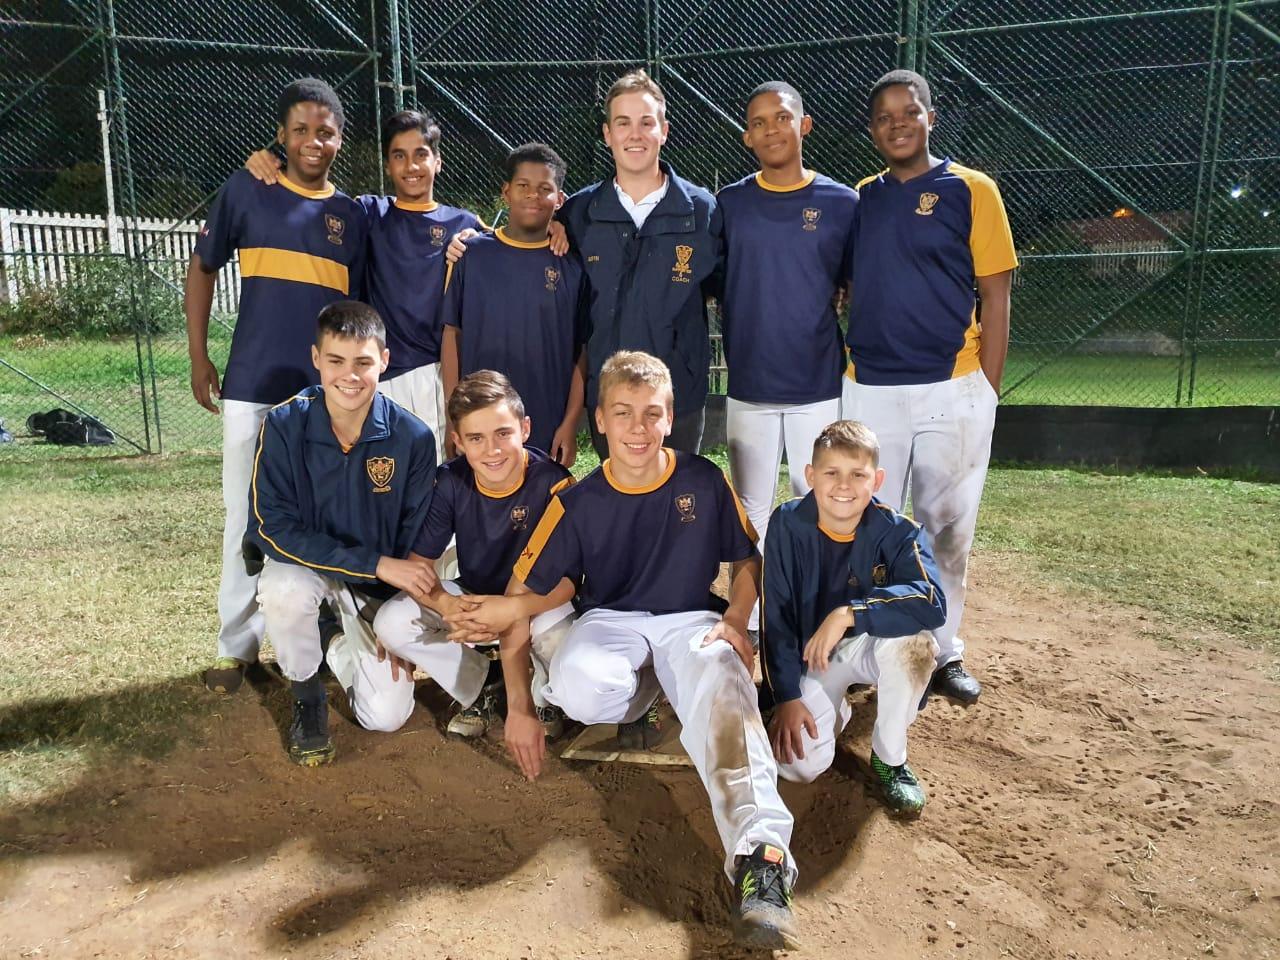 U16A Softball Team